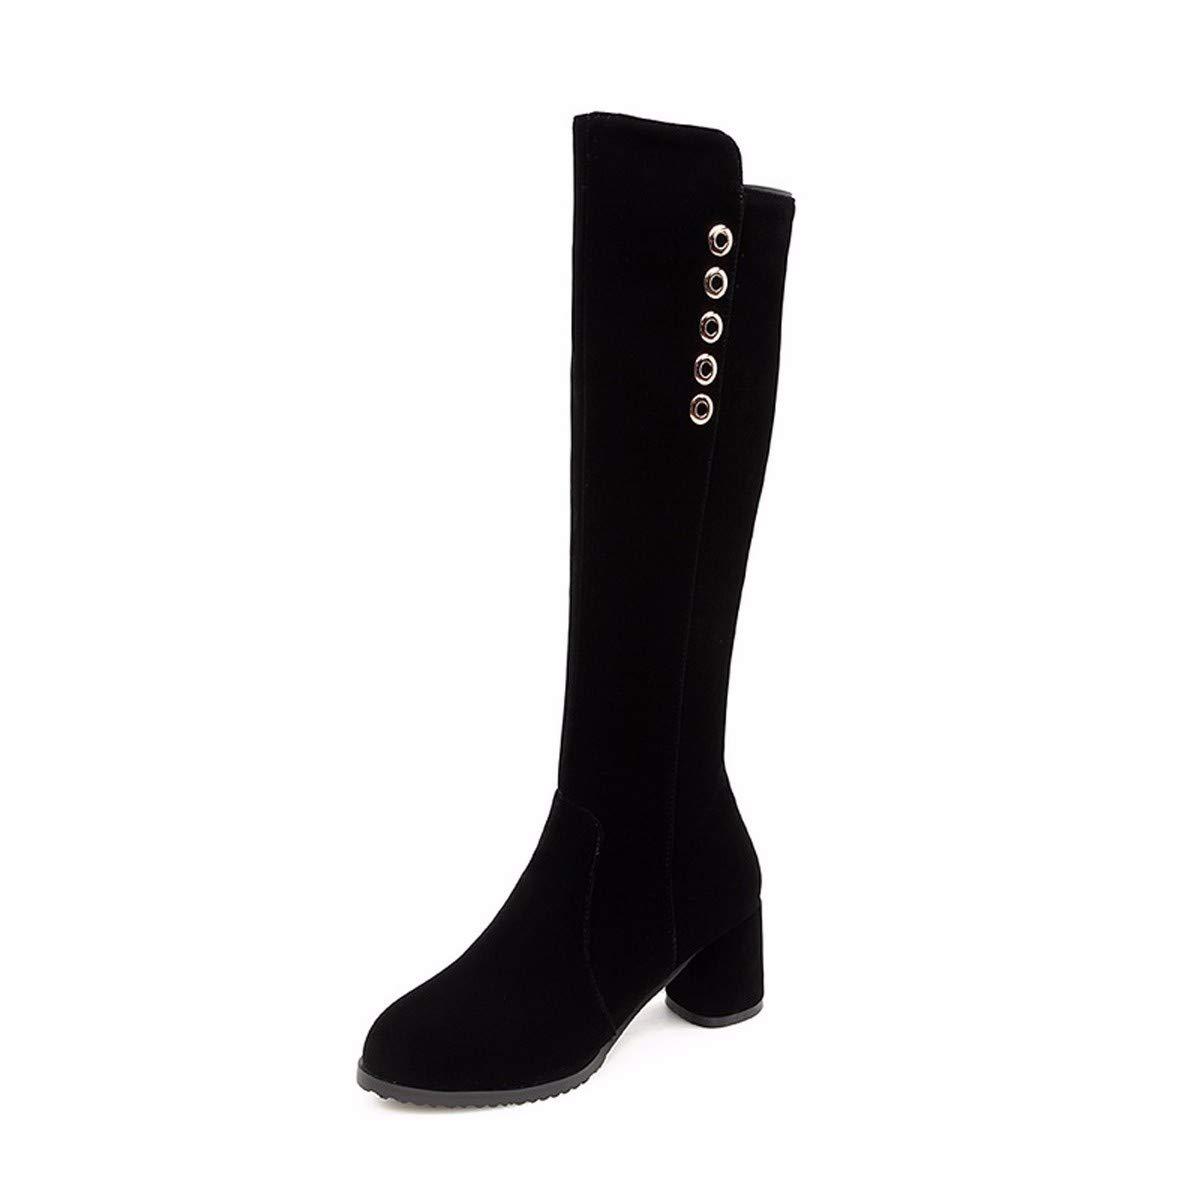 KPHY Damenschuhe Dünn Das Aber Das Dünn Knie Stiefel Heel 6 cm Dicke Sohle Hohe Stiefel Dicken Hintern Hohe Stiefel b8e1a8